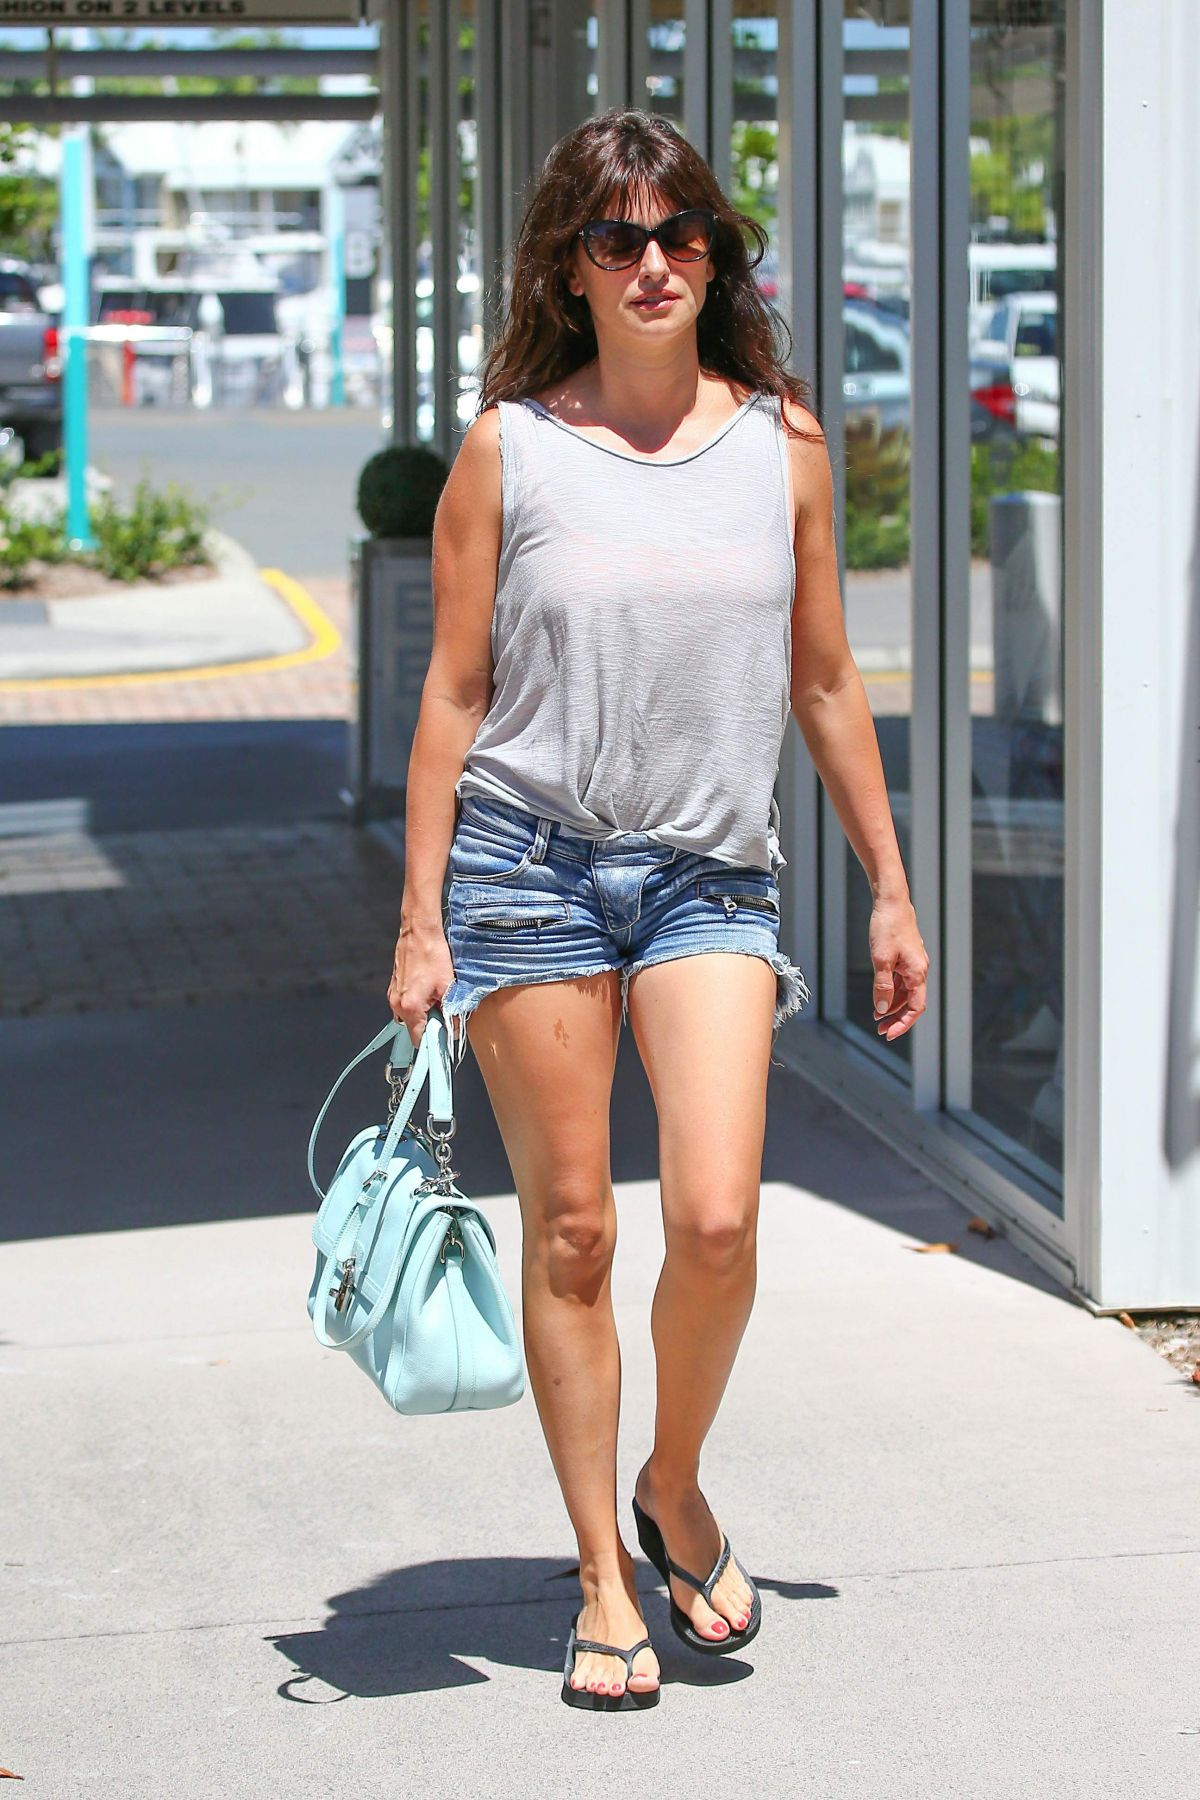 PENELOPE CRUZ in Denim Shorts Out at Gold Coast